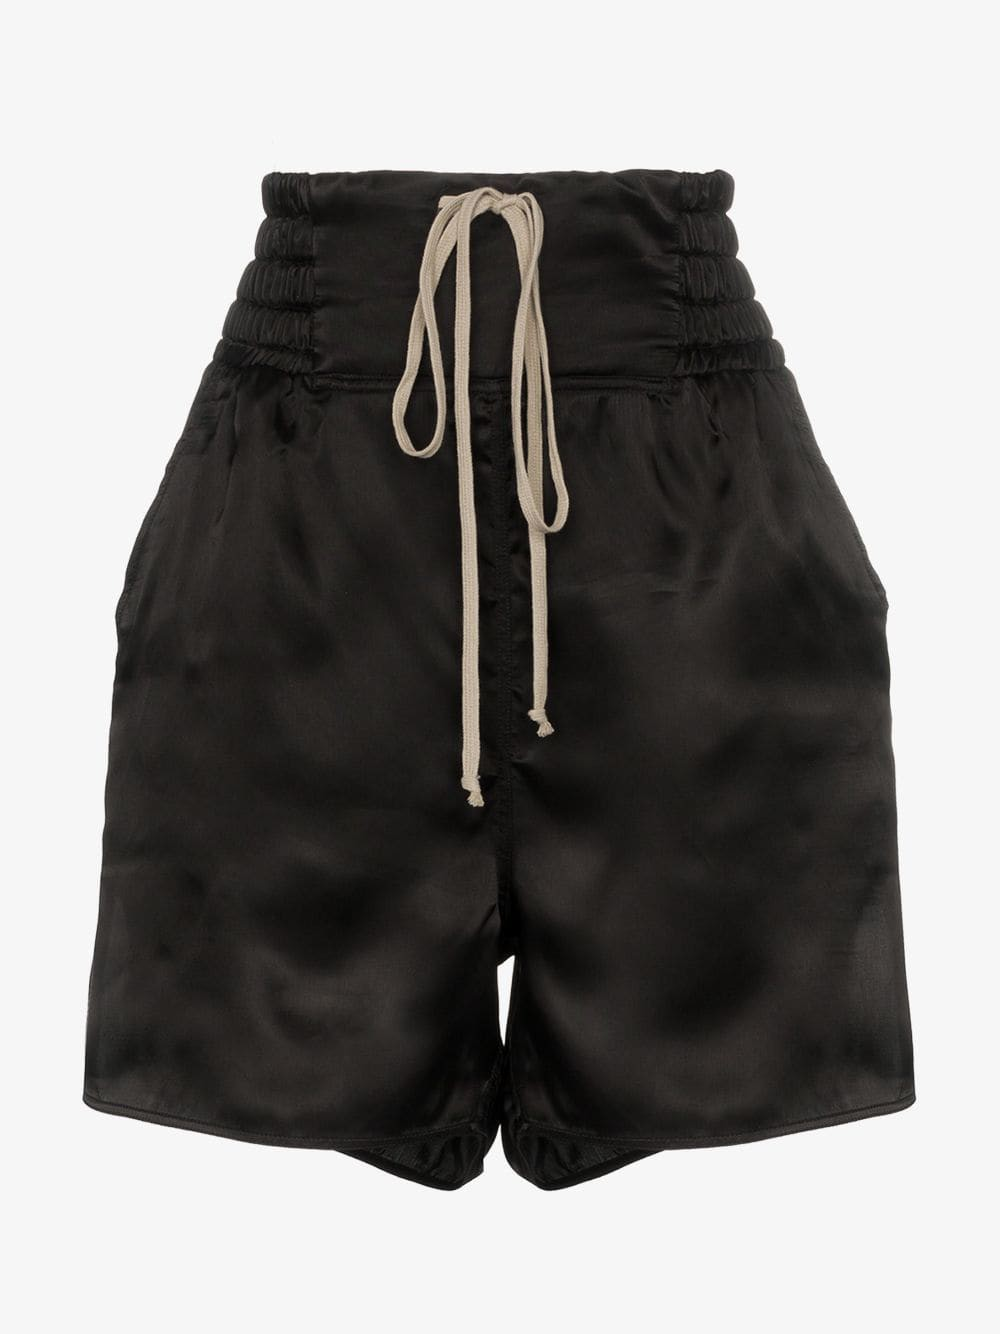 Rick Owens satin split side drawstring shorts in black